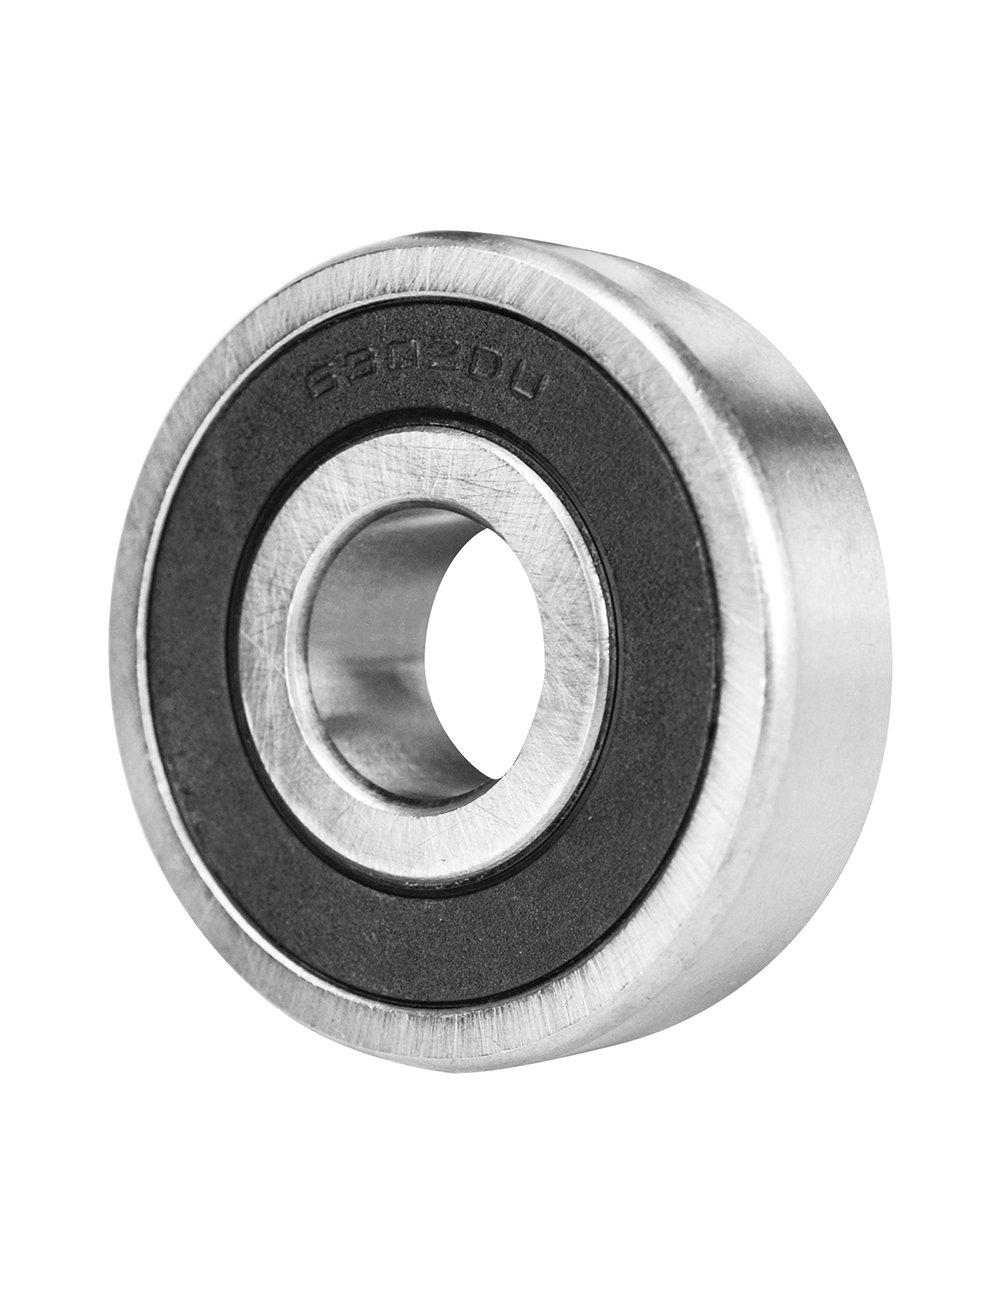 Clutch Pilot Bearing//Ball Bearing 6302DU fits GMC Duramax 1 pcs